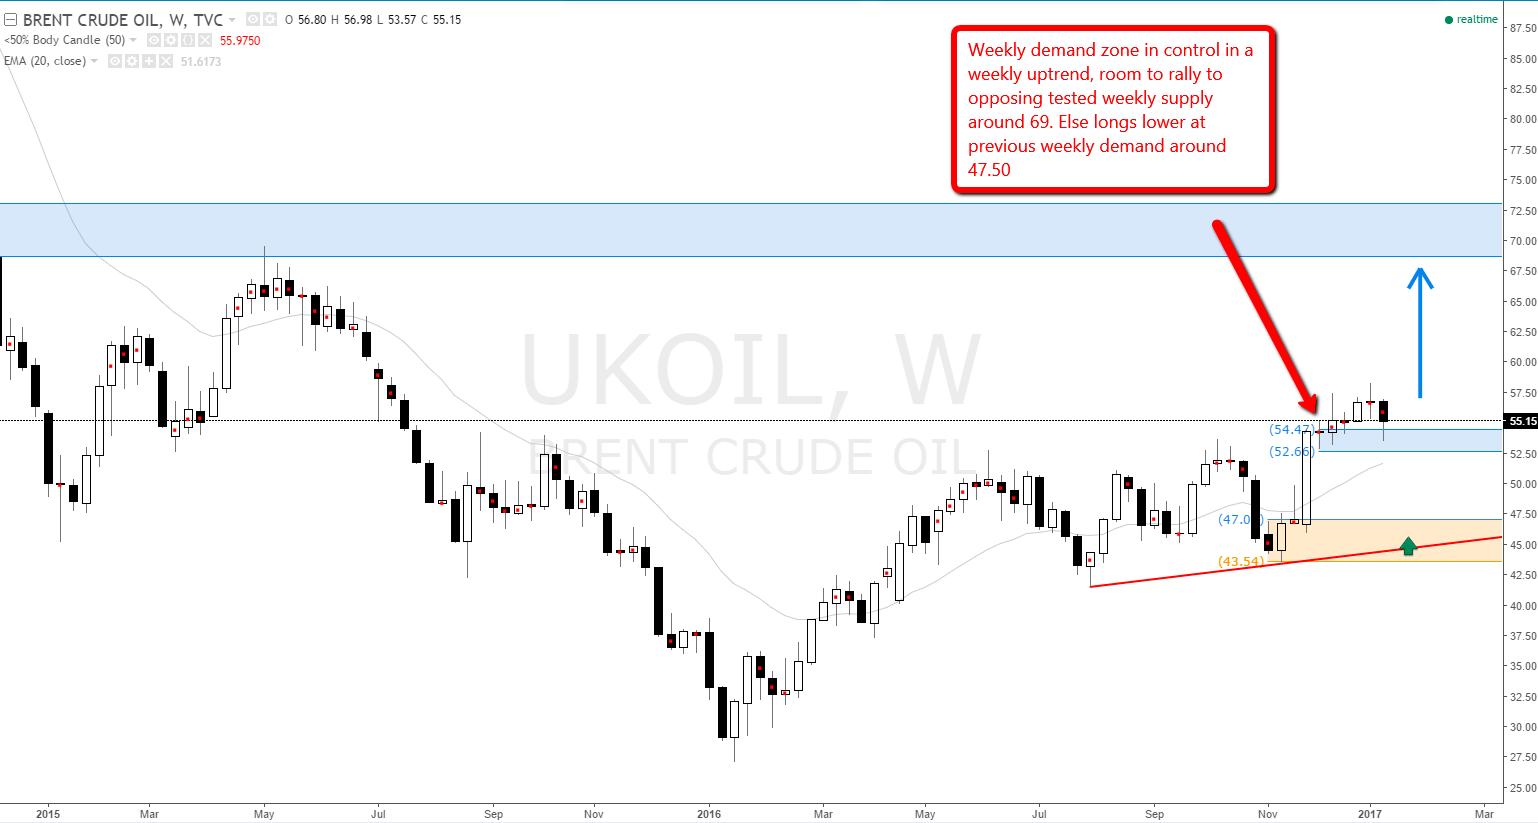 brent-ukoil-demand-level